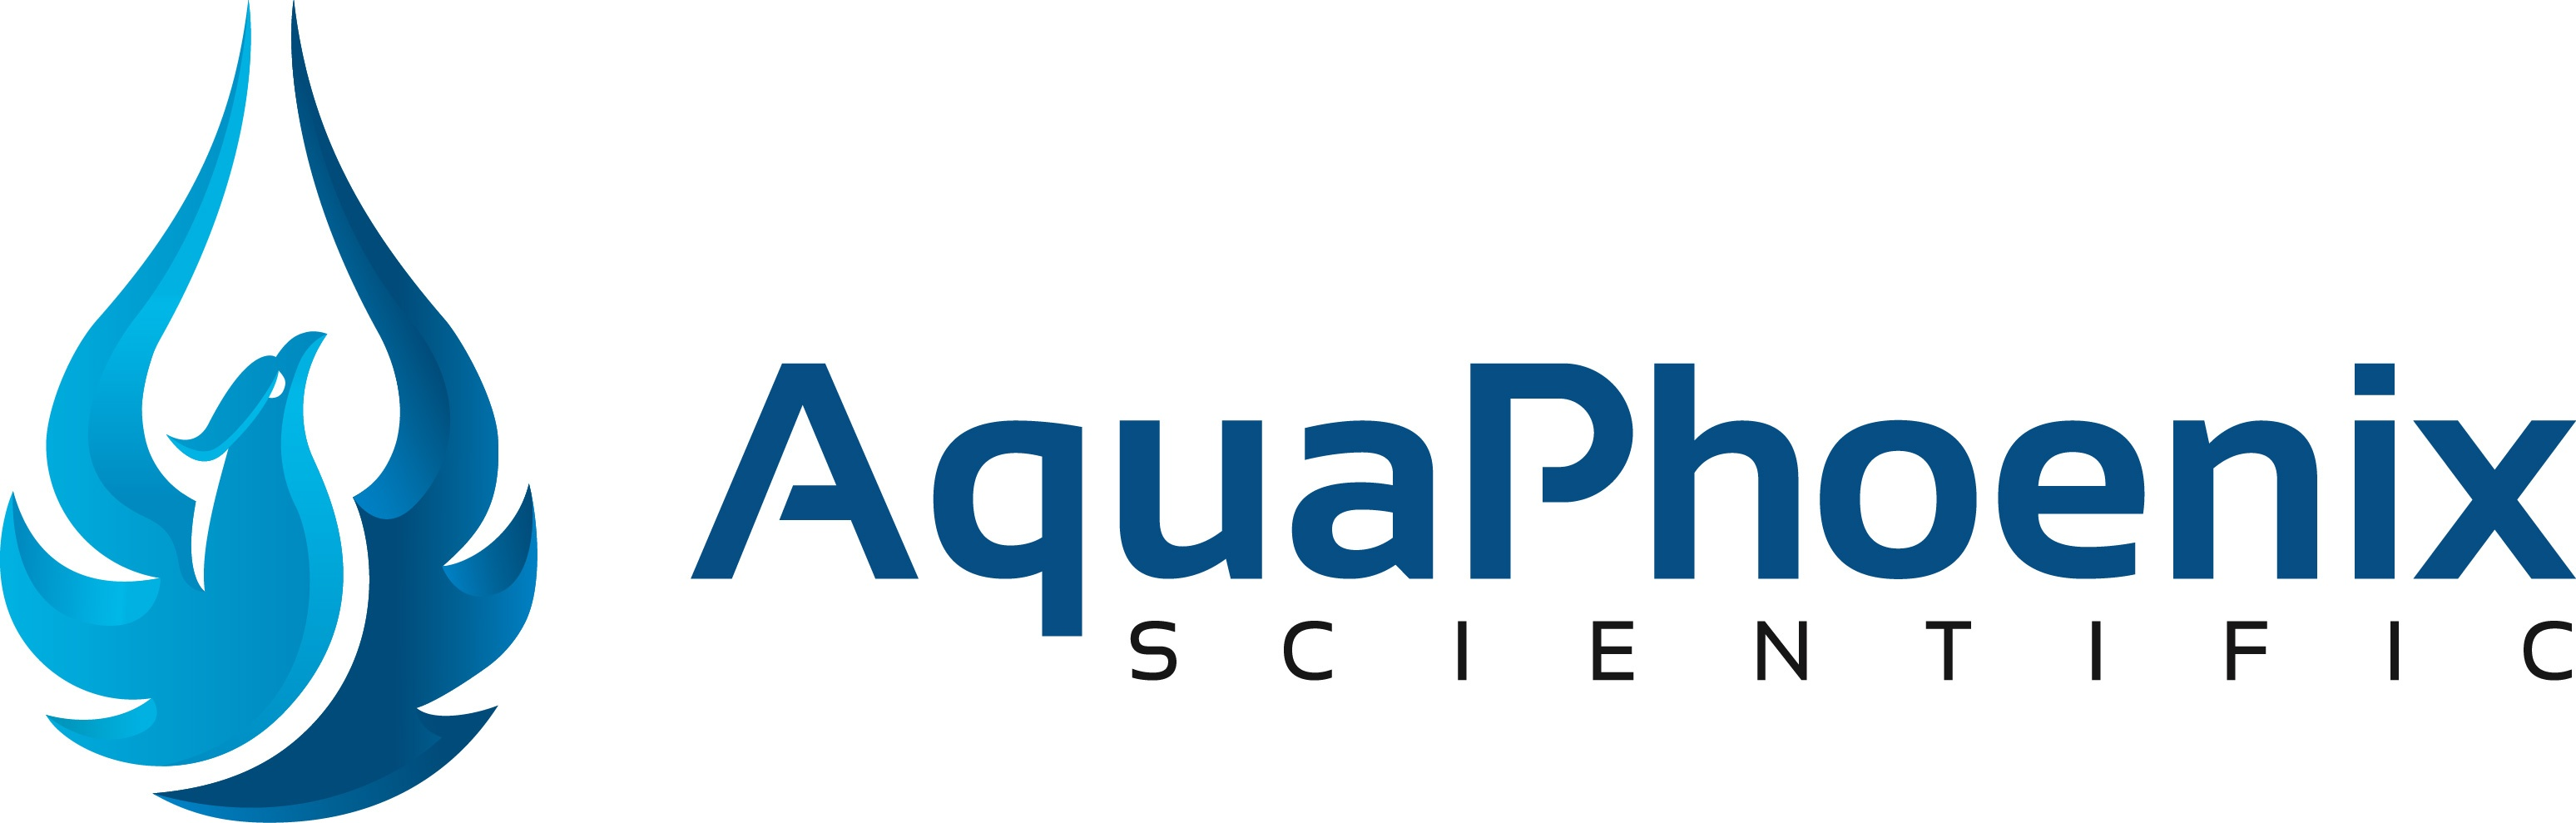 AquaPhoenix Logo_Horizontal_RGB.jpg